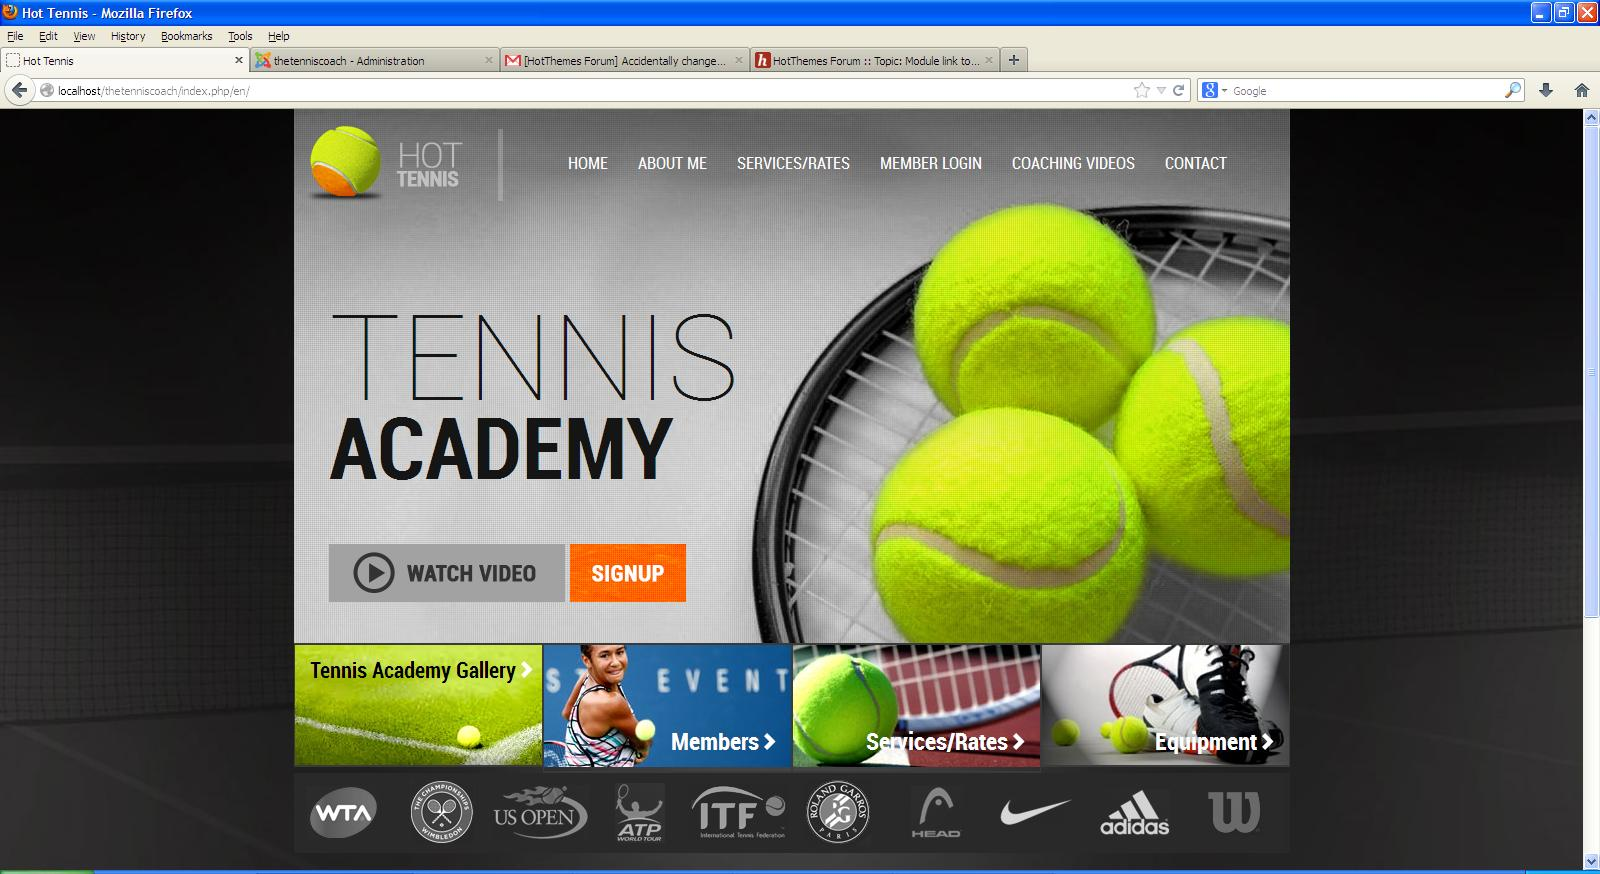 TenisAcademyGallery.JPG